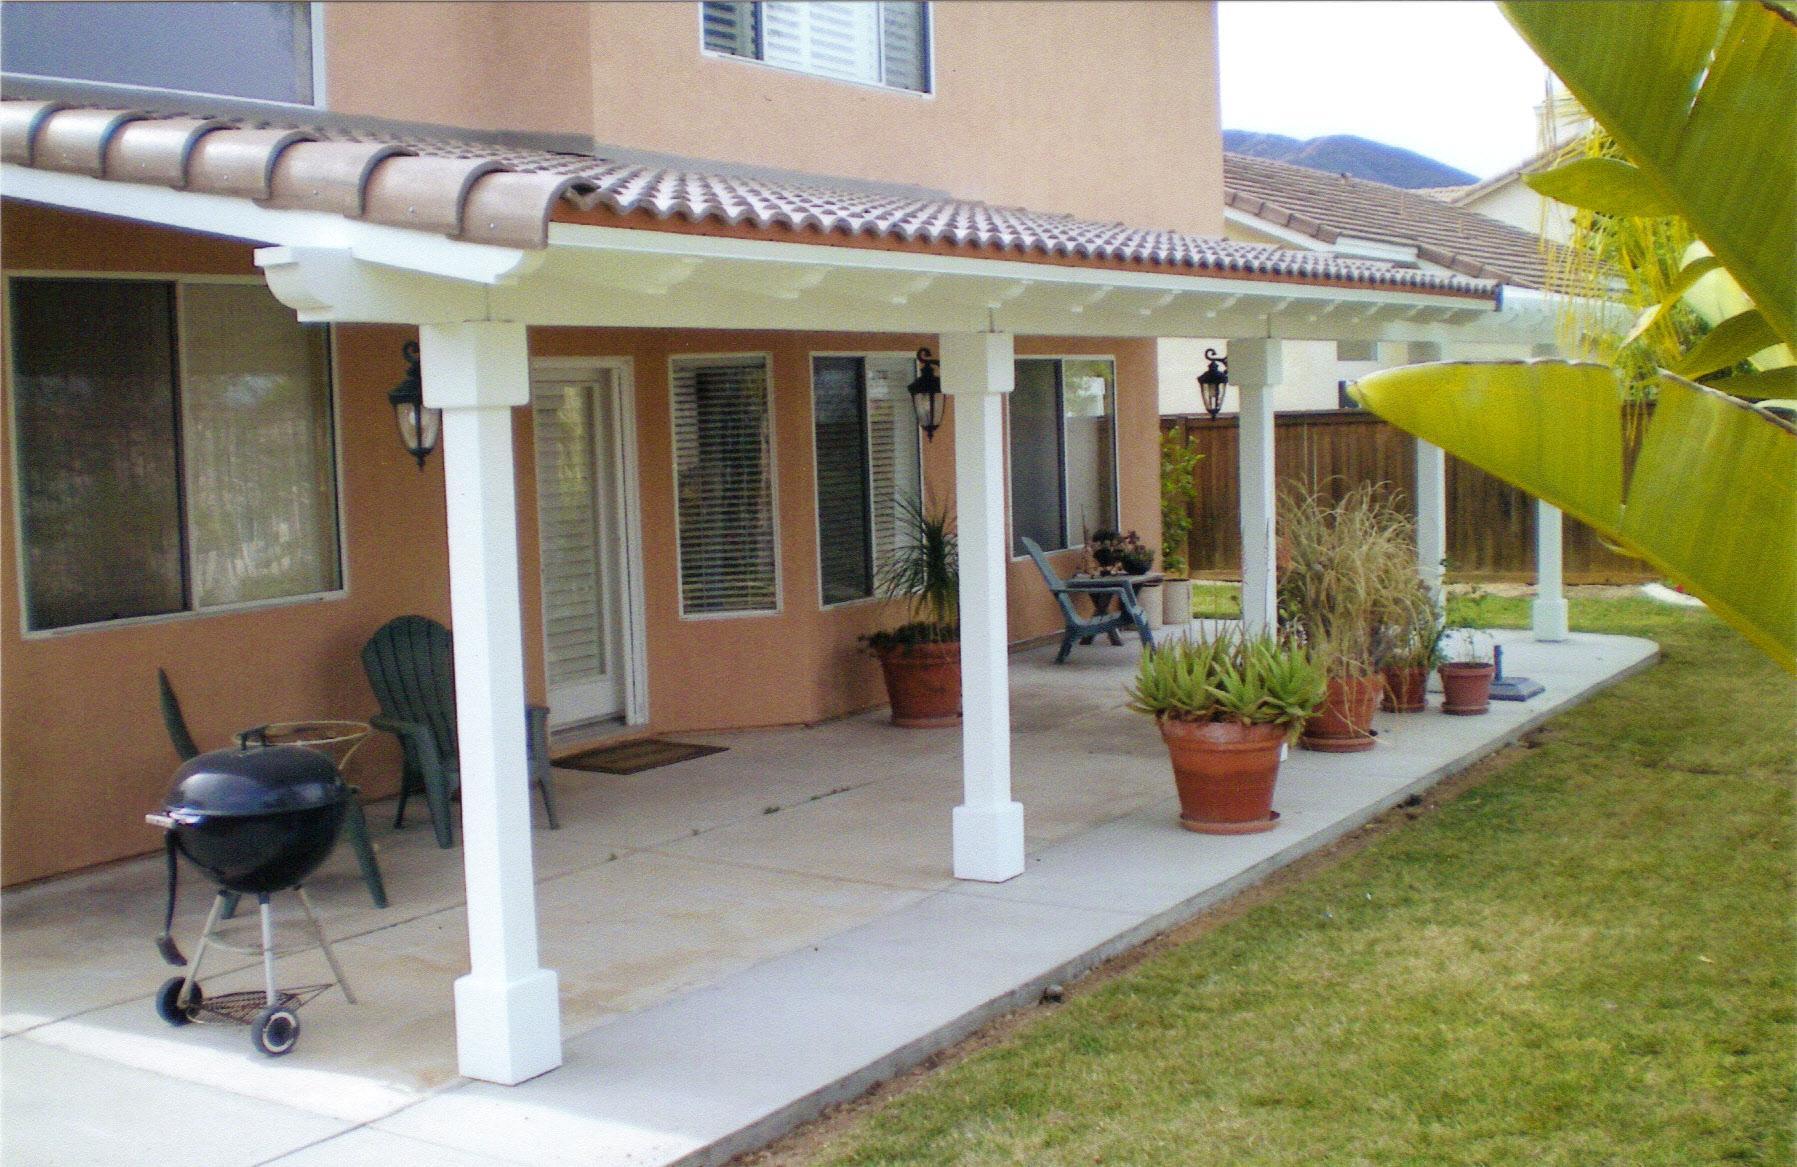 Natural Wooden Patio Covers - HomesFeed on Backyard Wood Patio Ideas id=42652